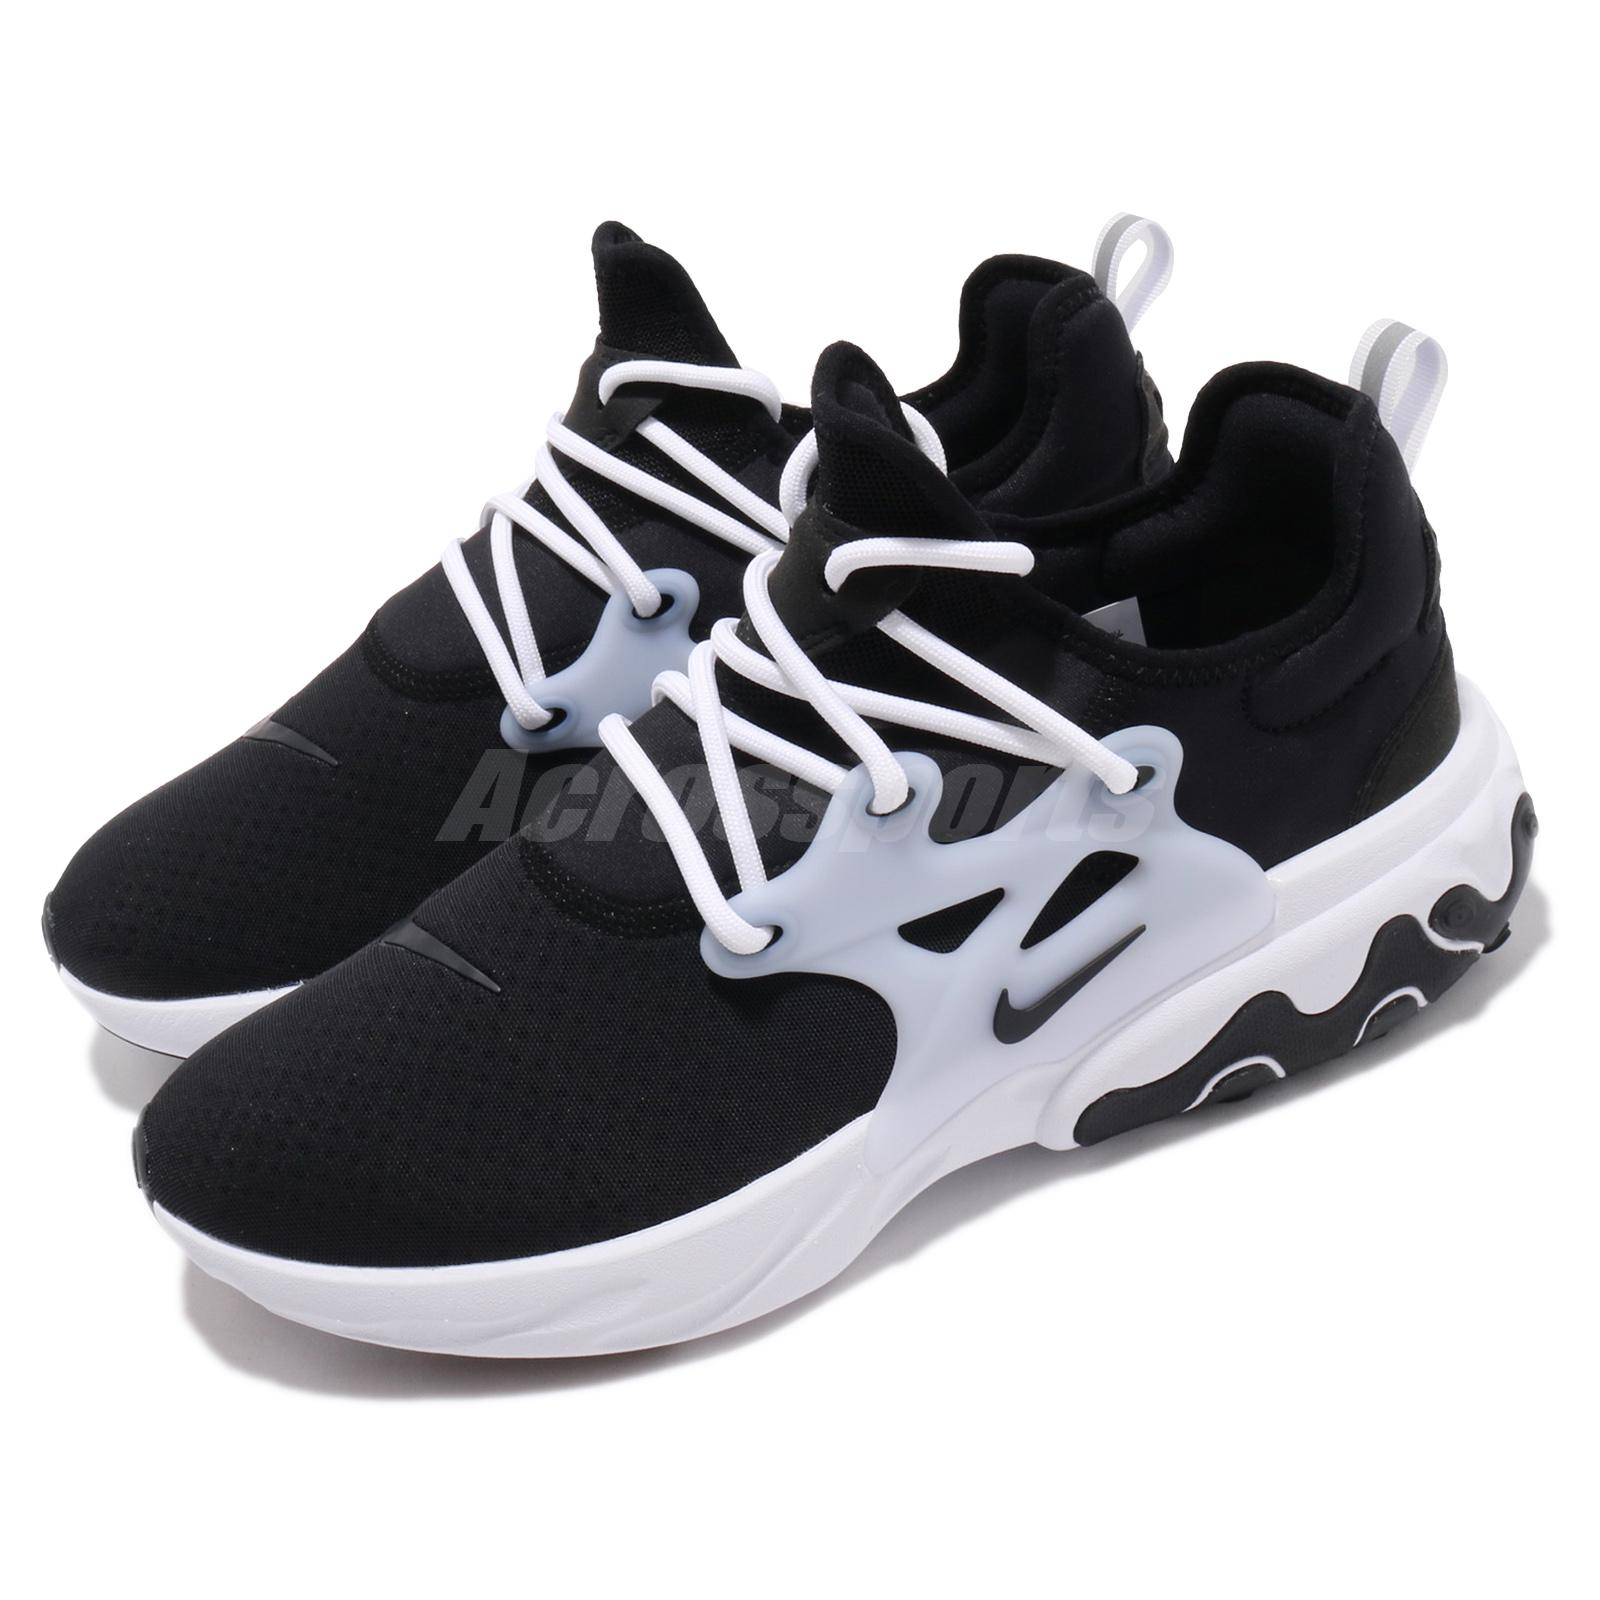 Details about Nike React Presto Black White Men Running Casual Shoes  Sneakers AV2605-003